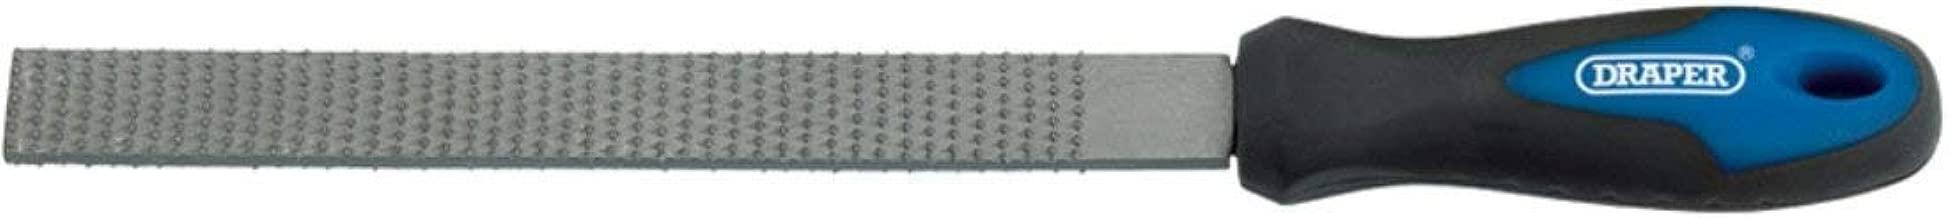 Draper 44960 200 mm Flat Cabinet File